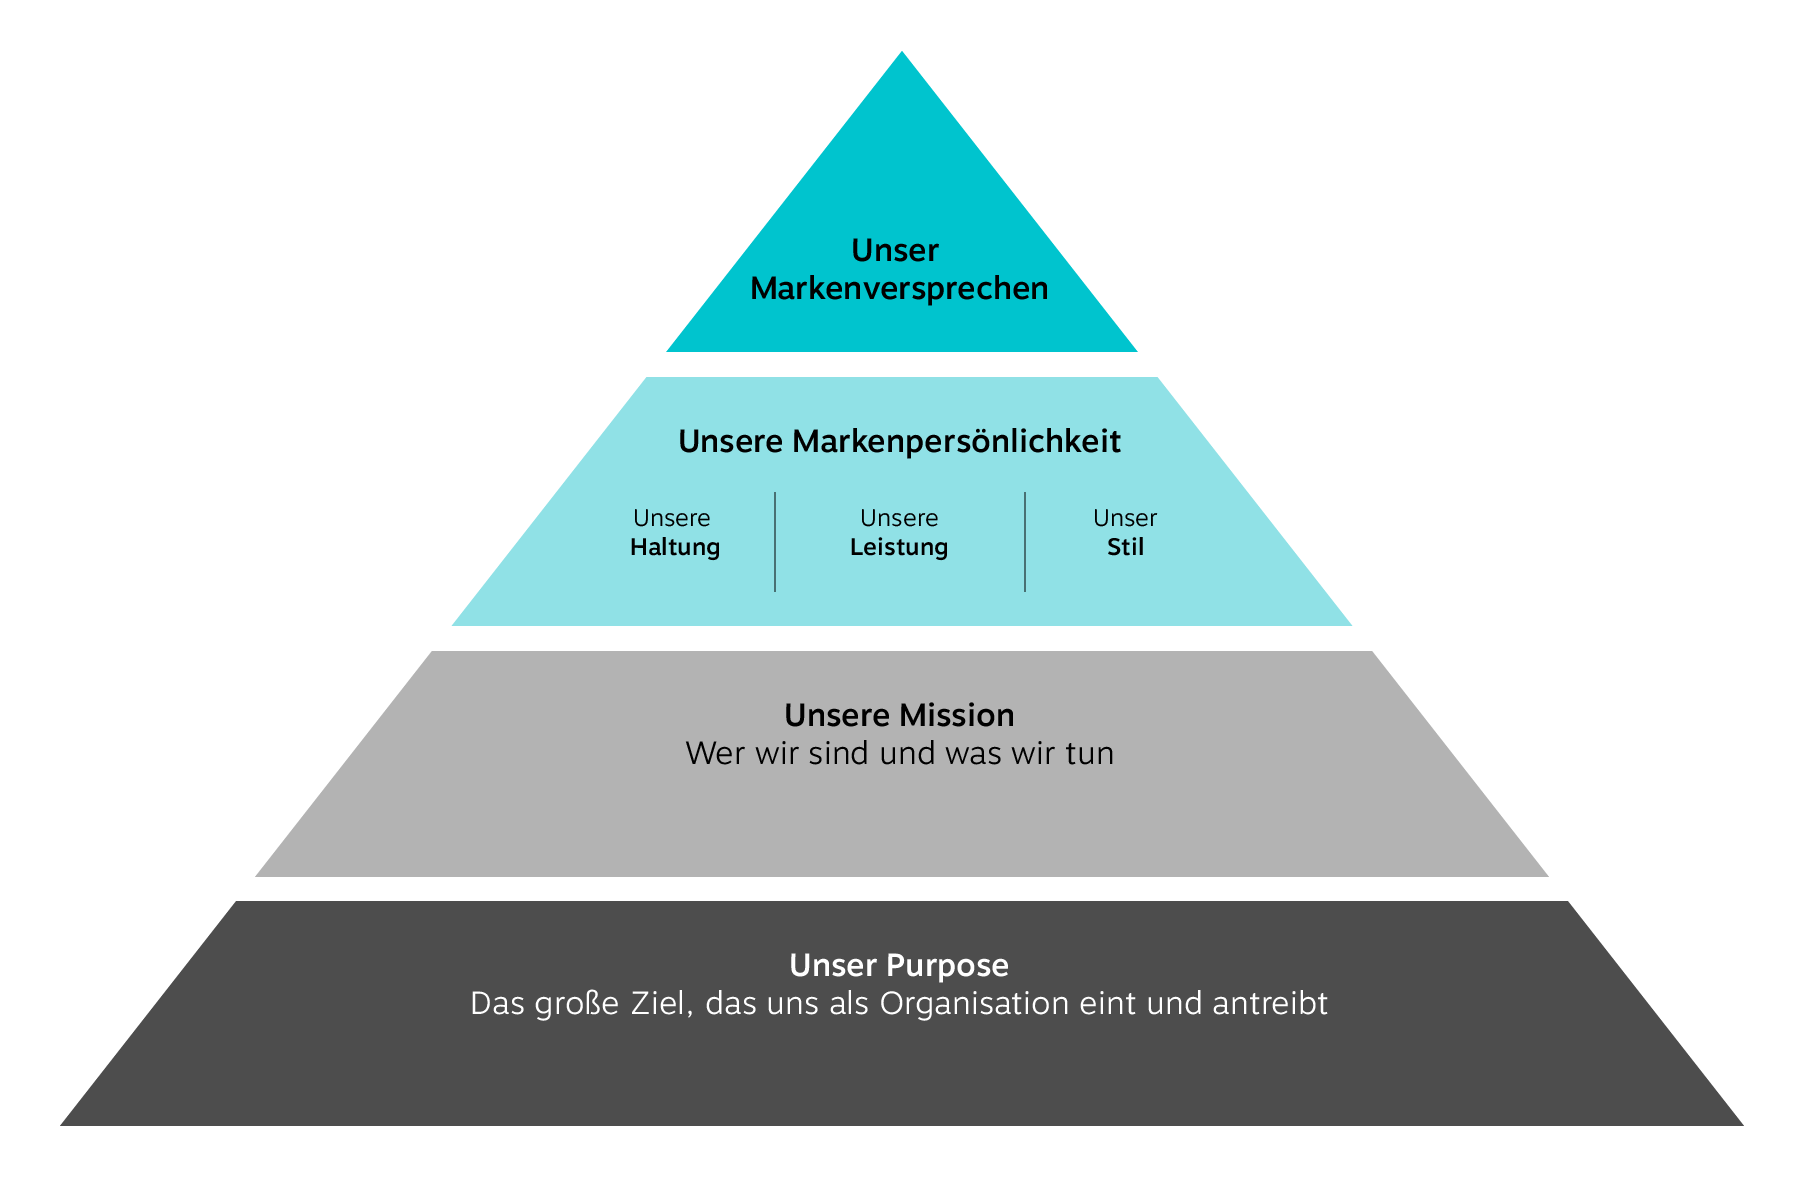 brandsformation_identitaetspyramide